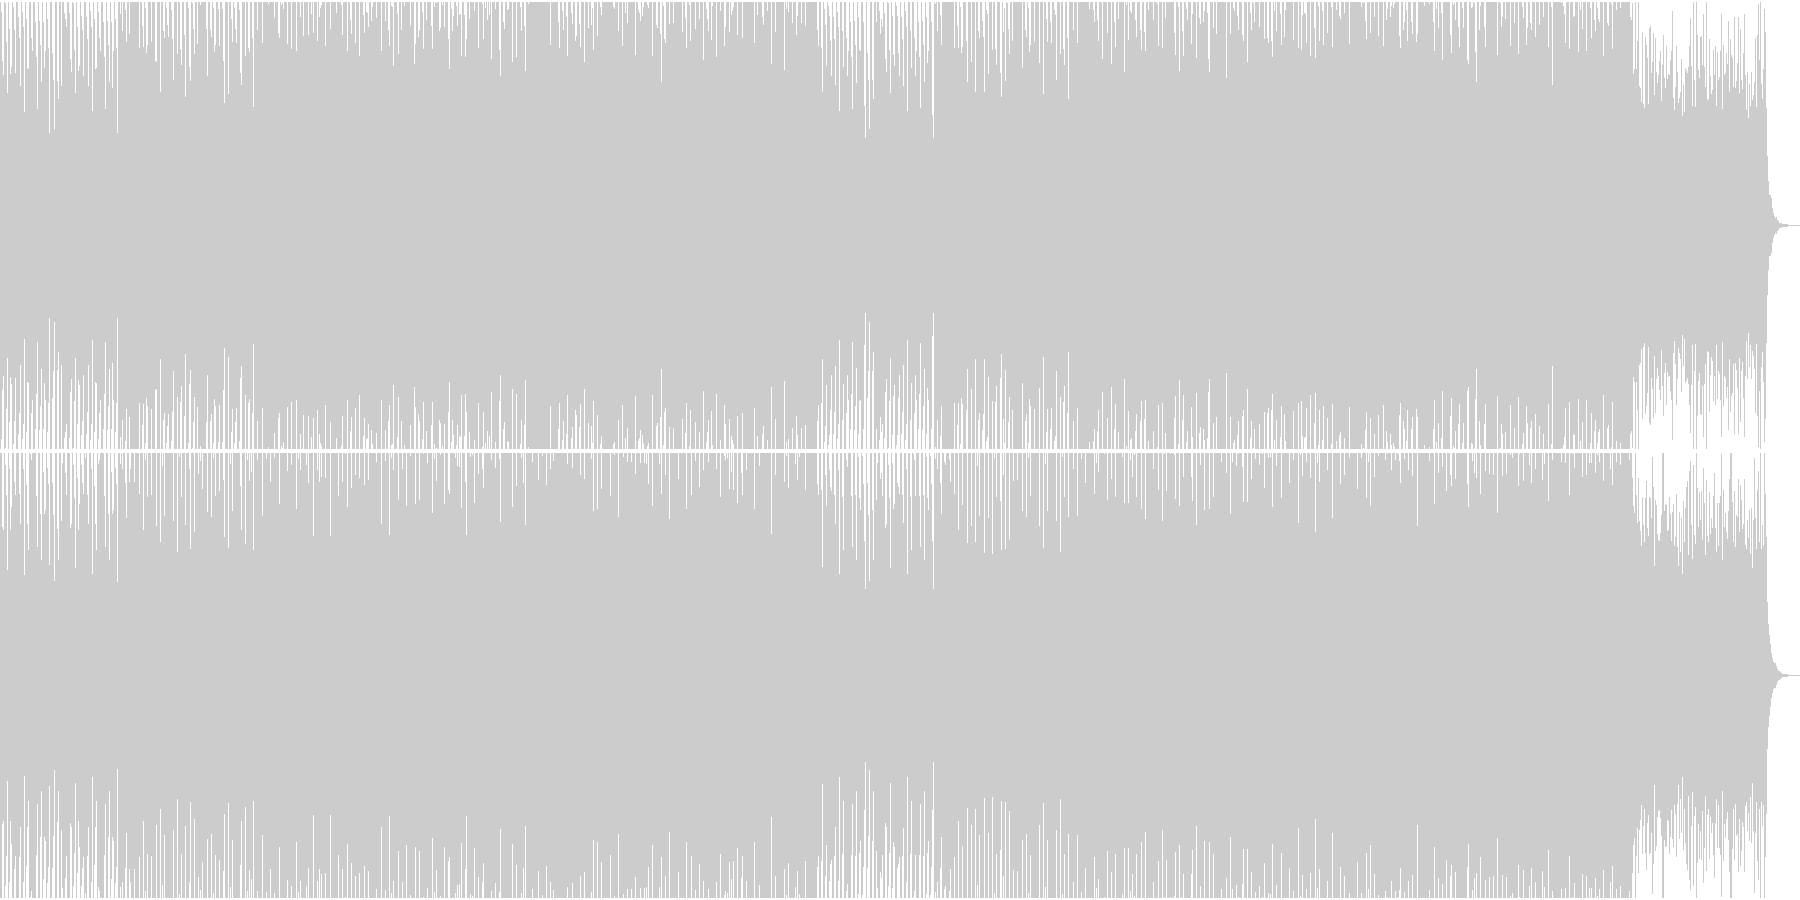 EDMクラブ系、製品紹介、商品紹介-10の未再生の波形